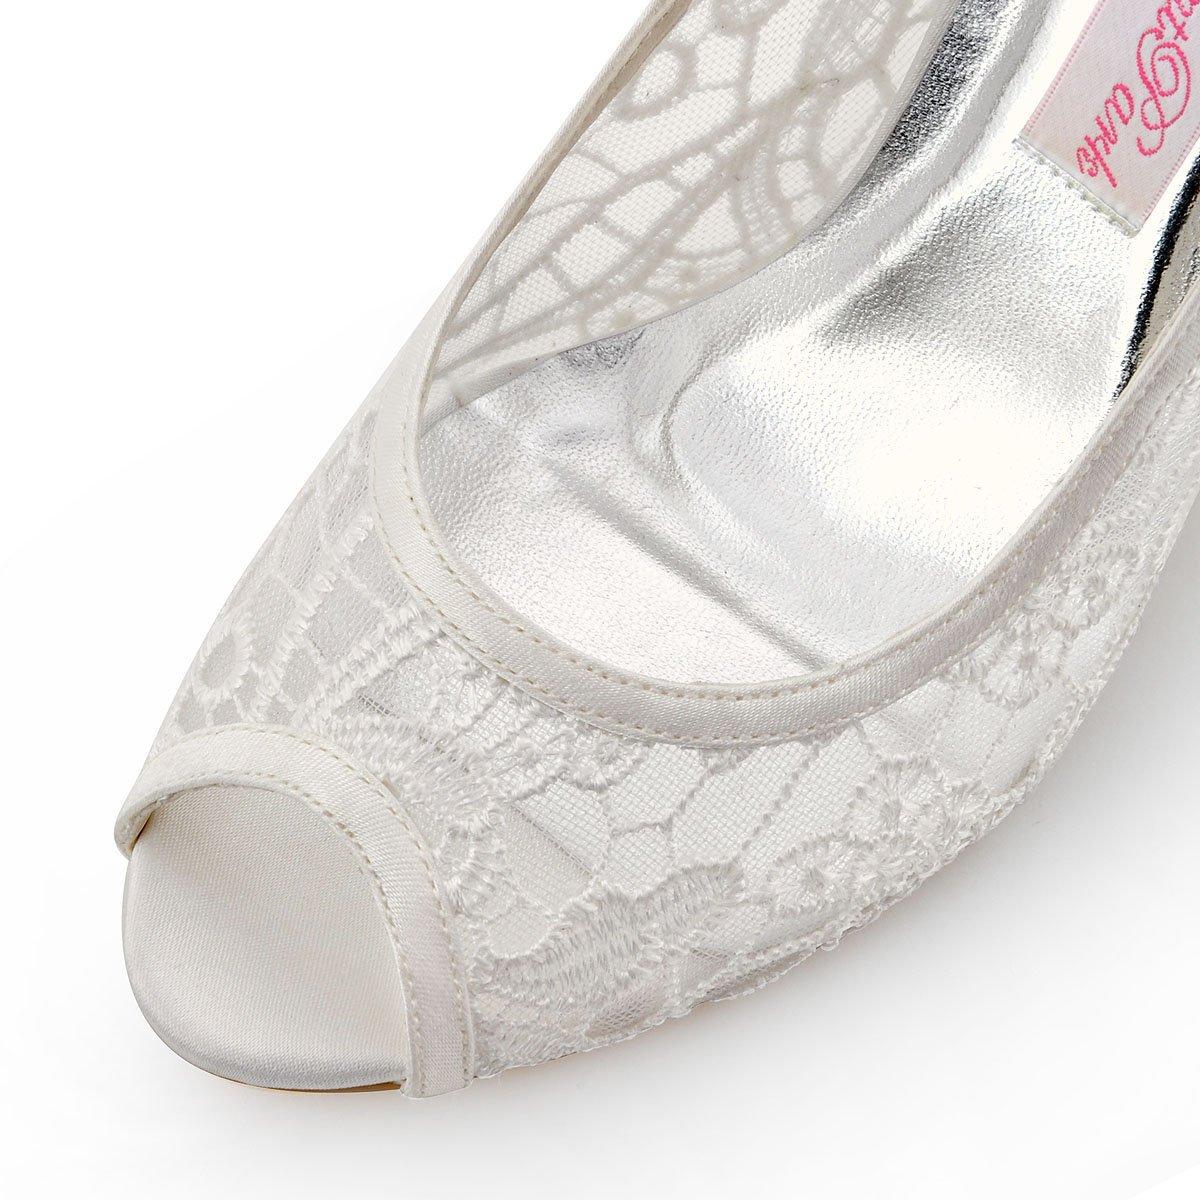 ElegantPark Ivory Women Peep Toe High Heel Pumps Vintage Lace Wedding Dress Shoes 3